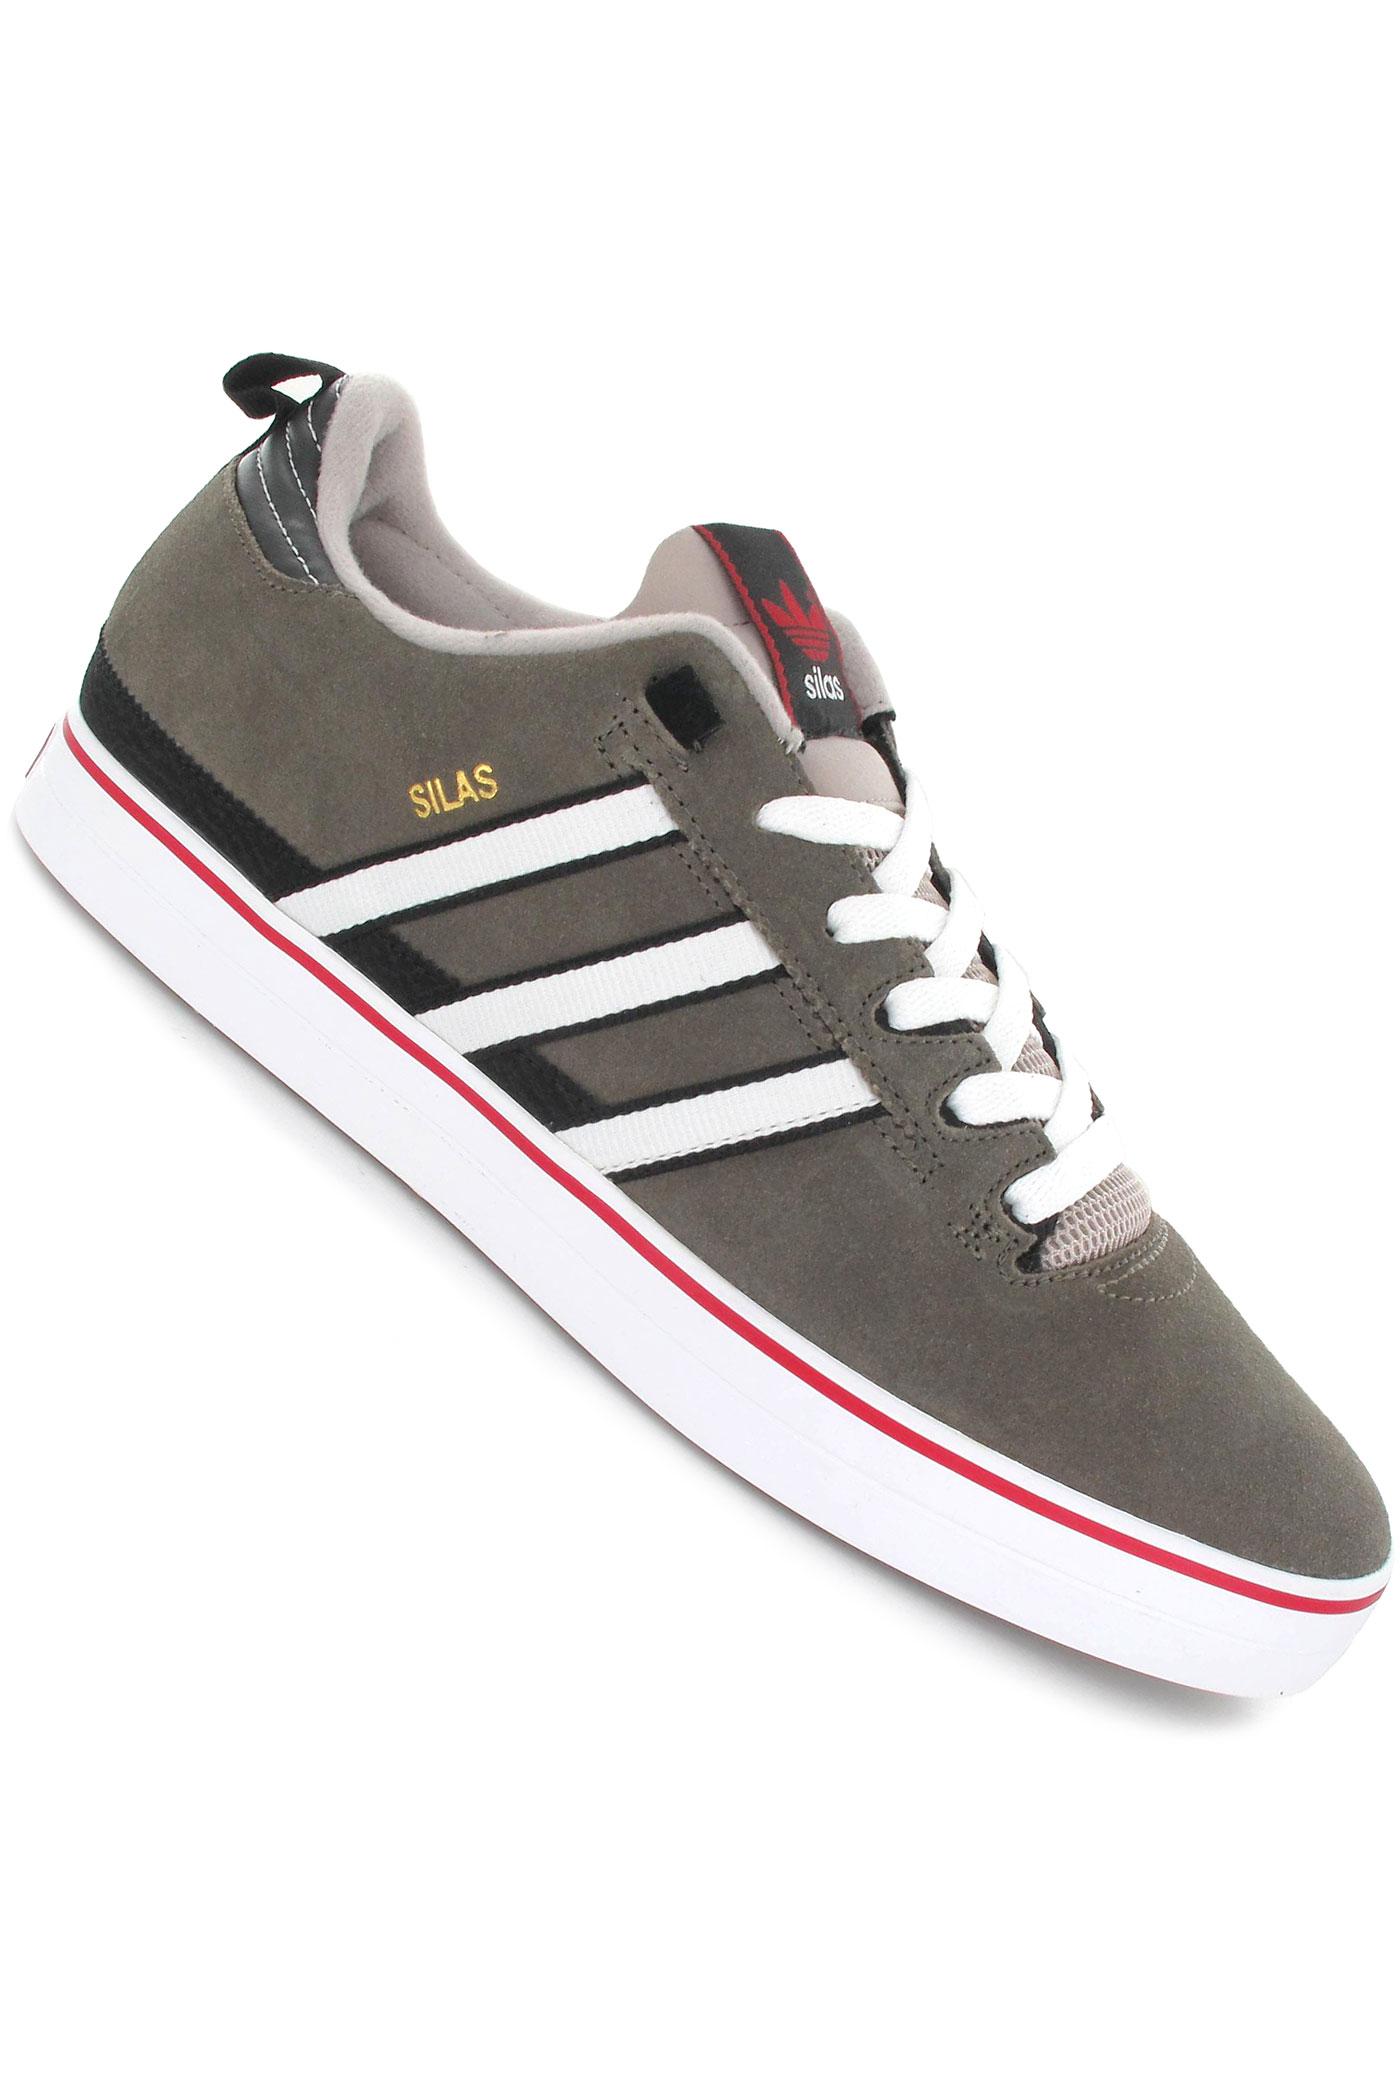 adidas skateboarding silas